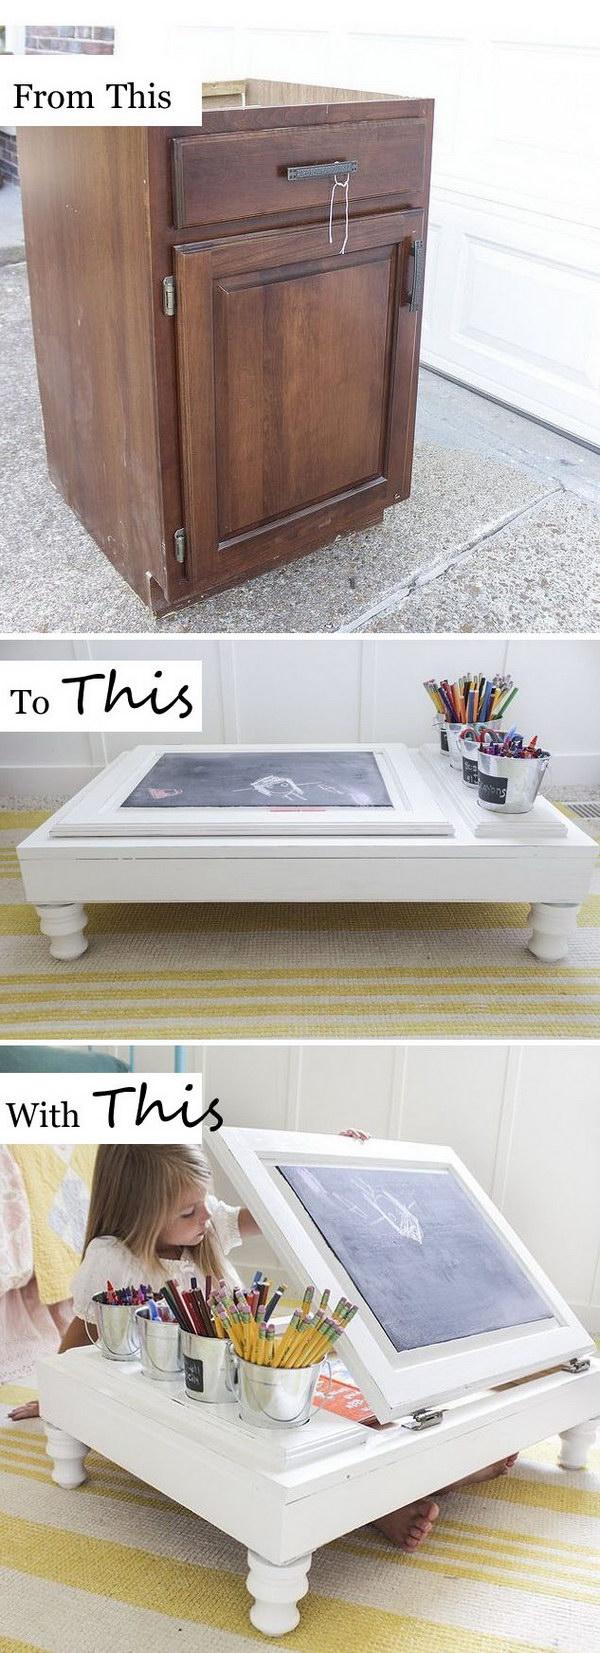 Kitchen Cabinet Into a Child's Desk.